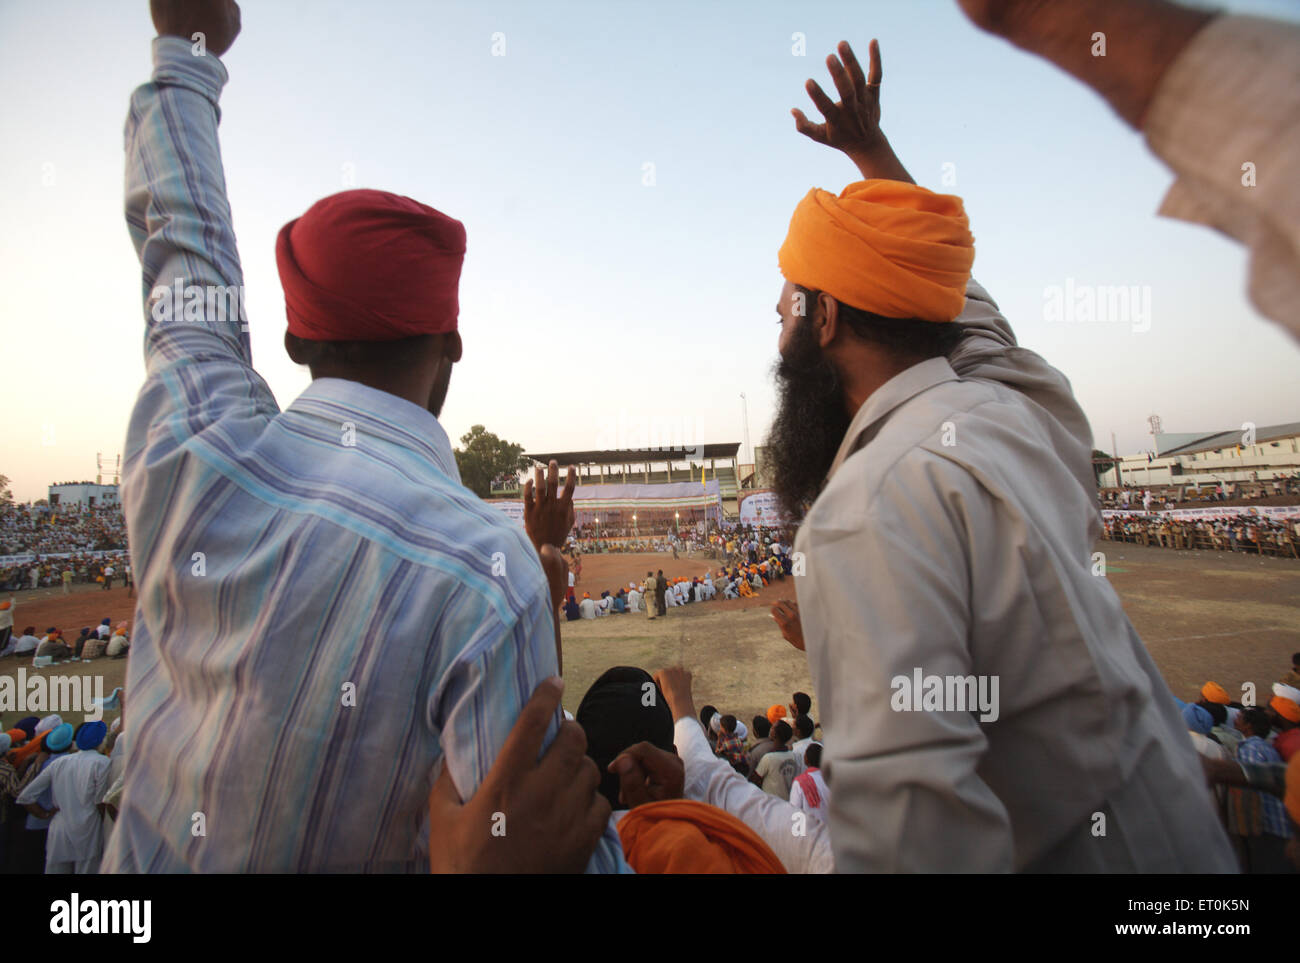 Sikh devotees encouraging players wrestling match ; perpetual Sikh Guru Granth Sahib at Khalsa Sports ground ; Nanded - Stock Image